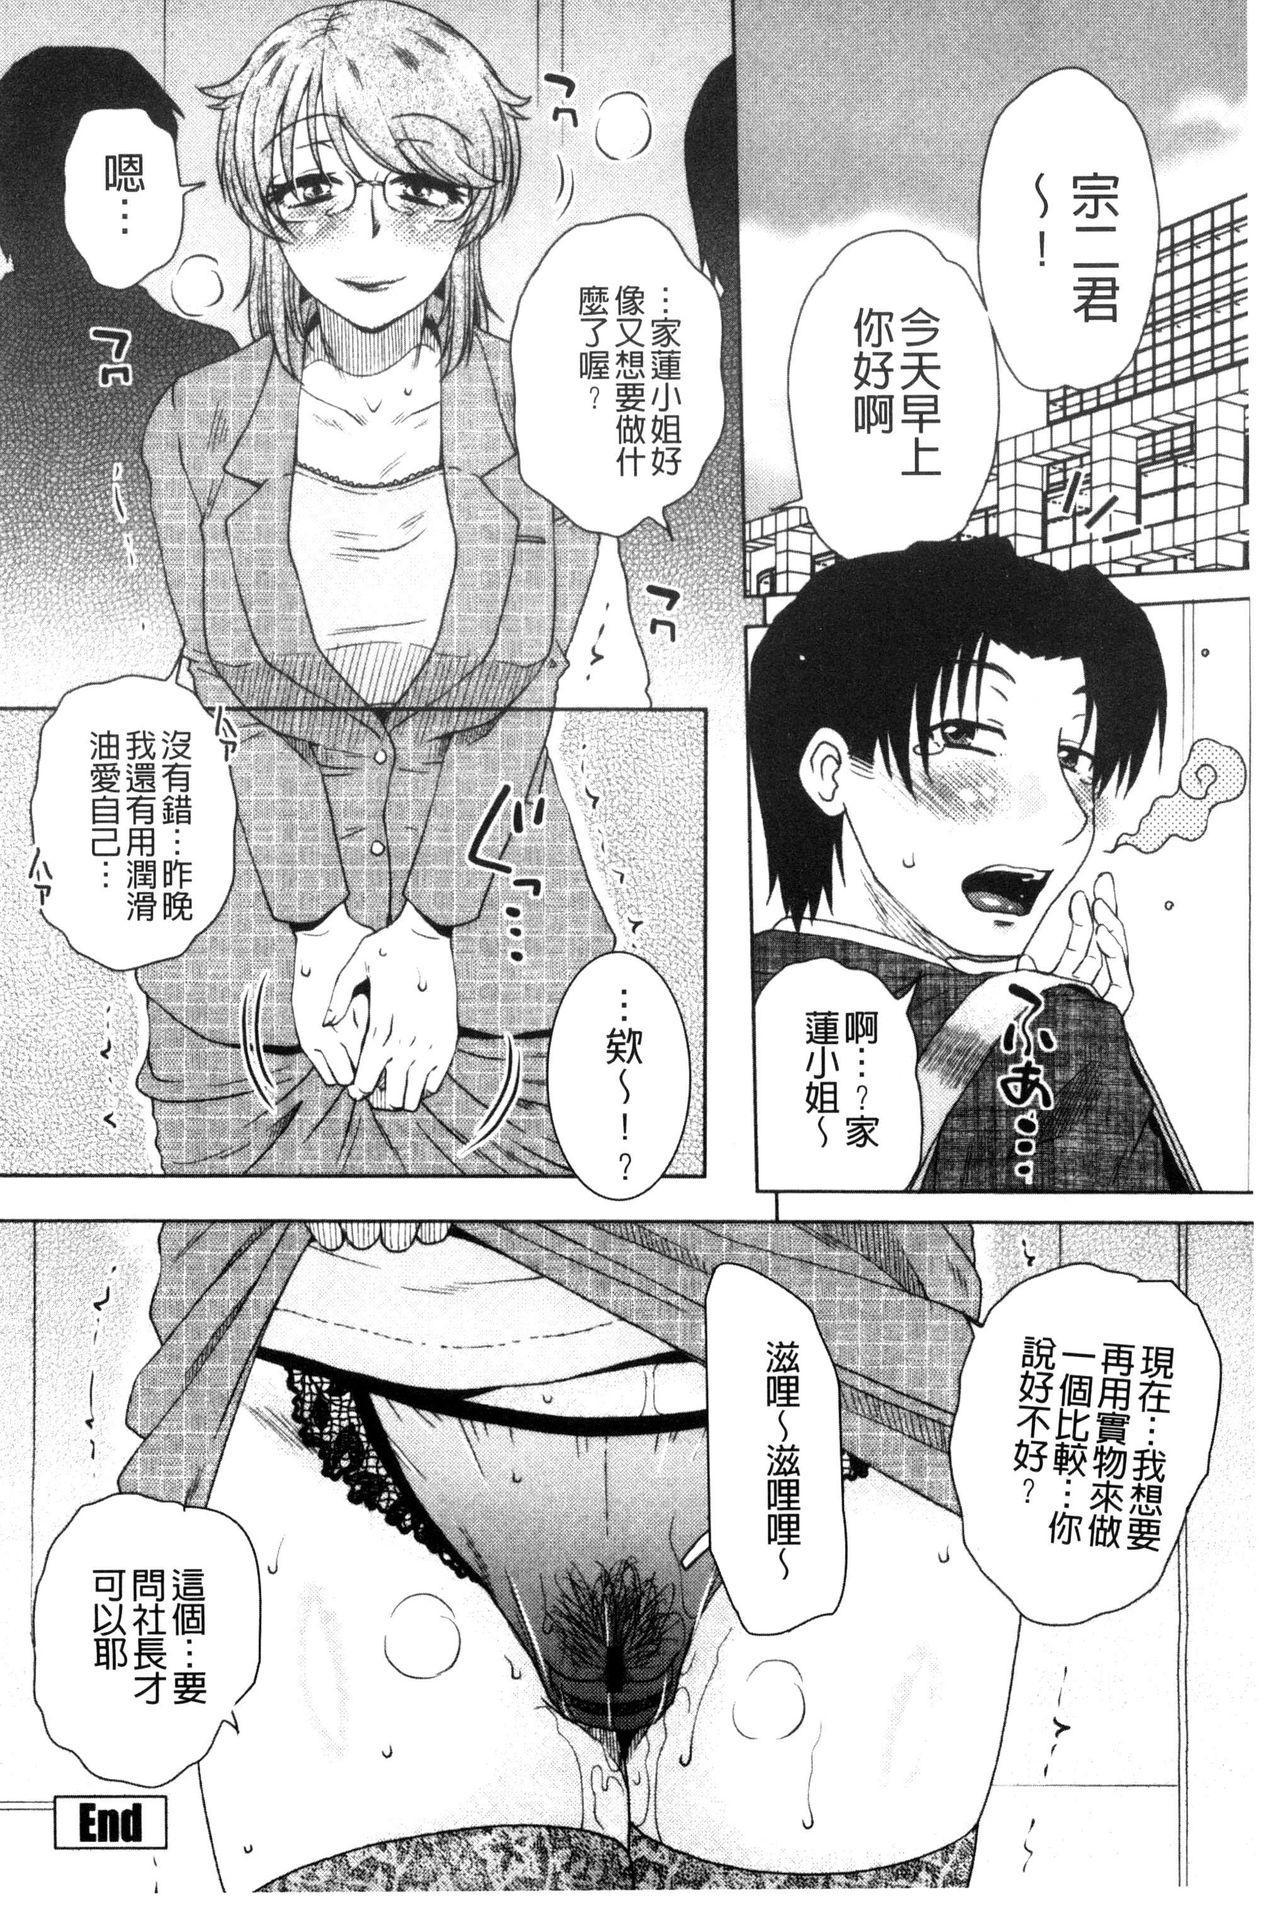 [Kurumiya Mashimin] Uchi no Shachou no Hamedere Inkatsu - Our President is HAME-DERE in Licentious sex life. [Chinese] 46